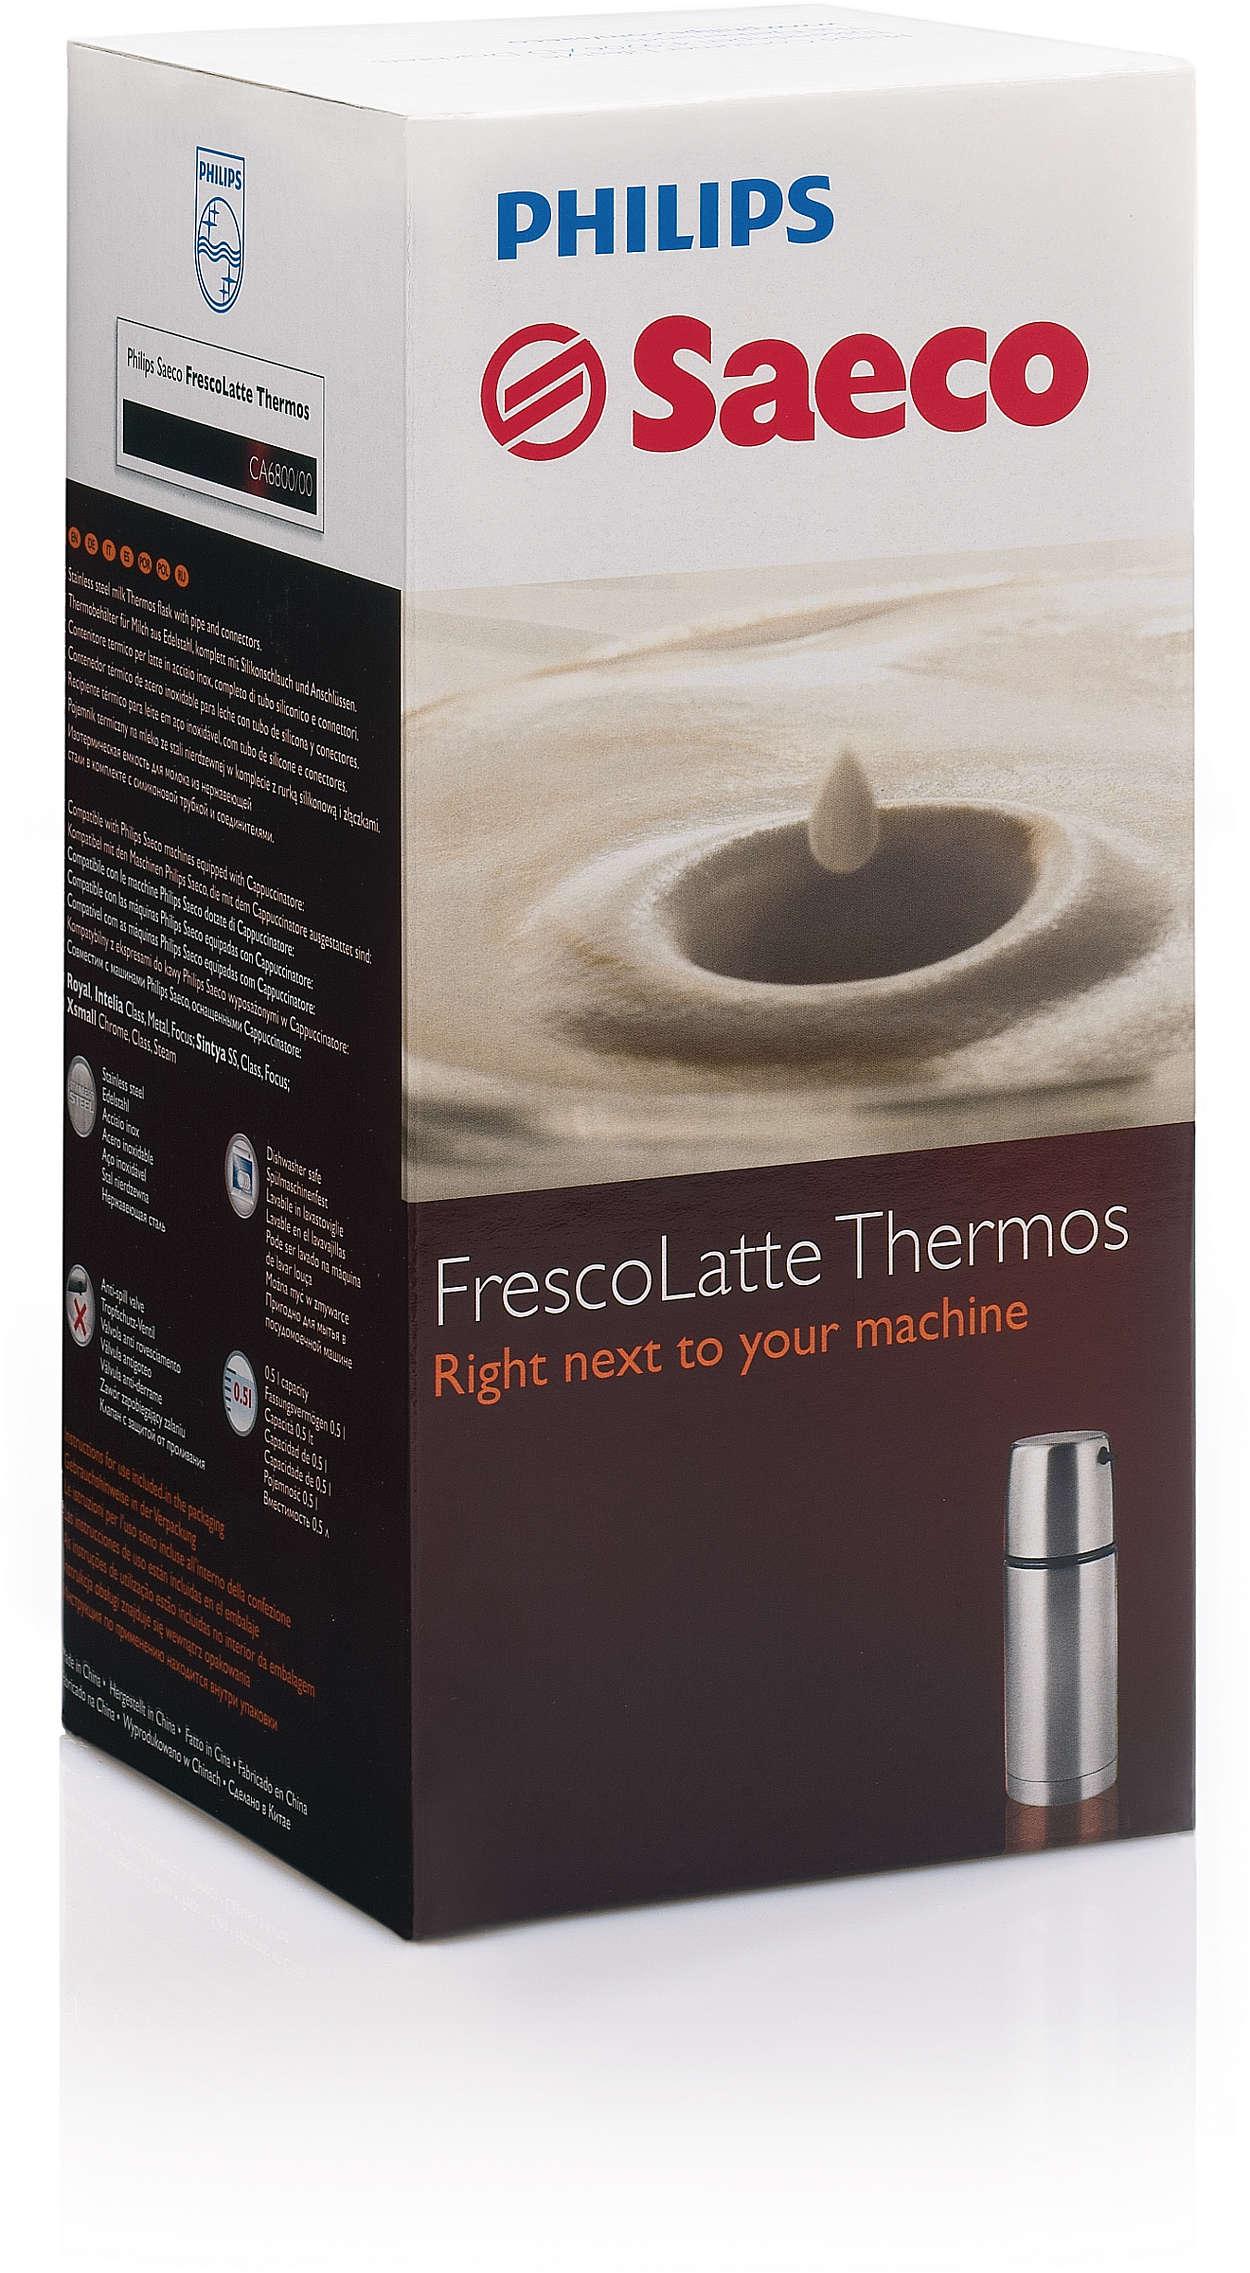 FrescoLatte thermische kan